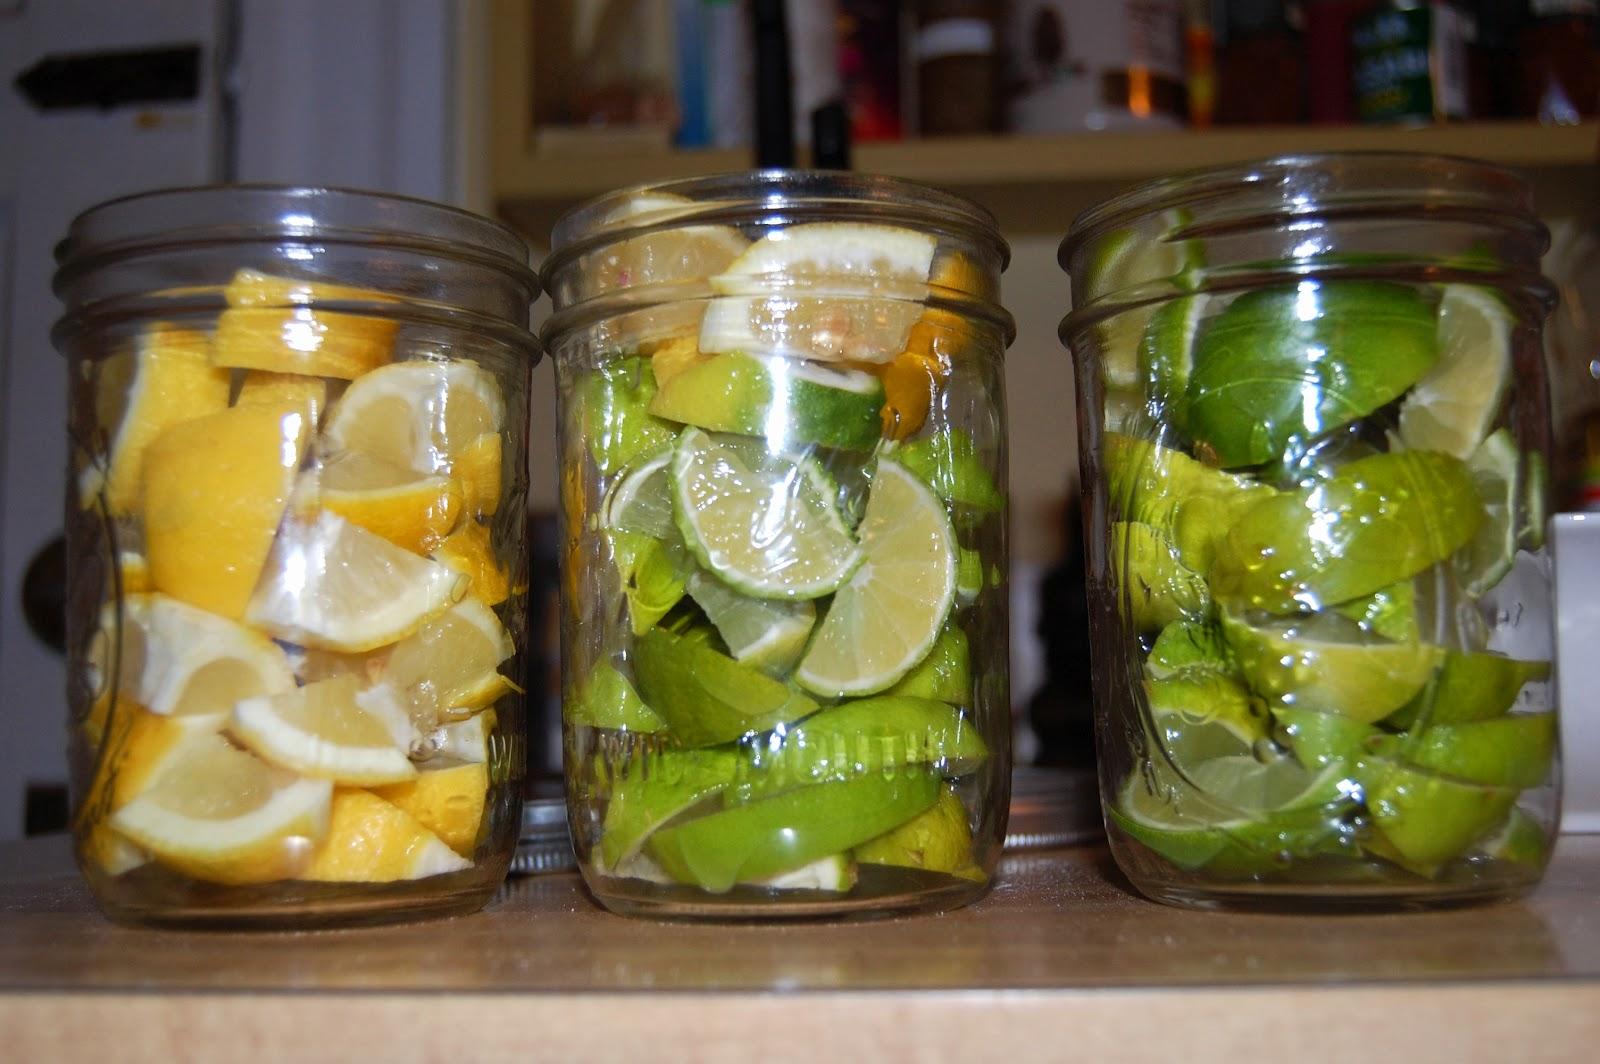 Life Gives You Lemons? Pickle it!